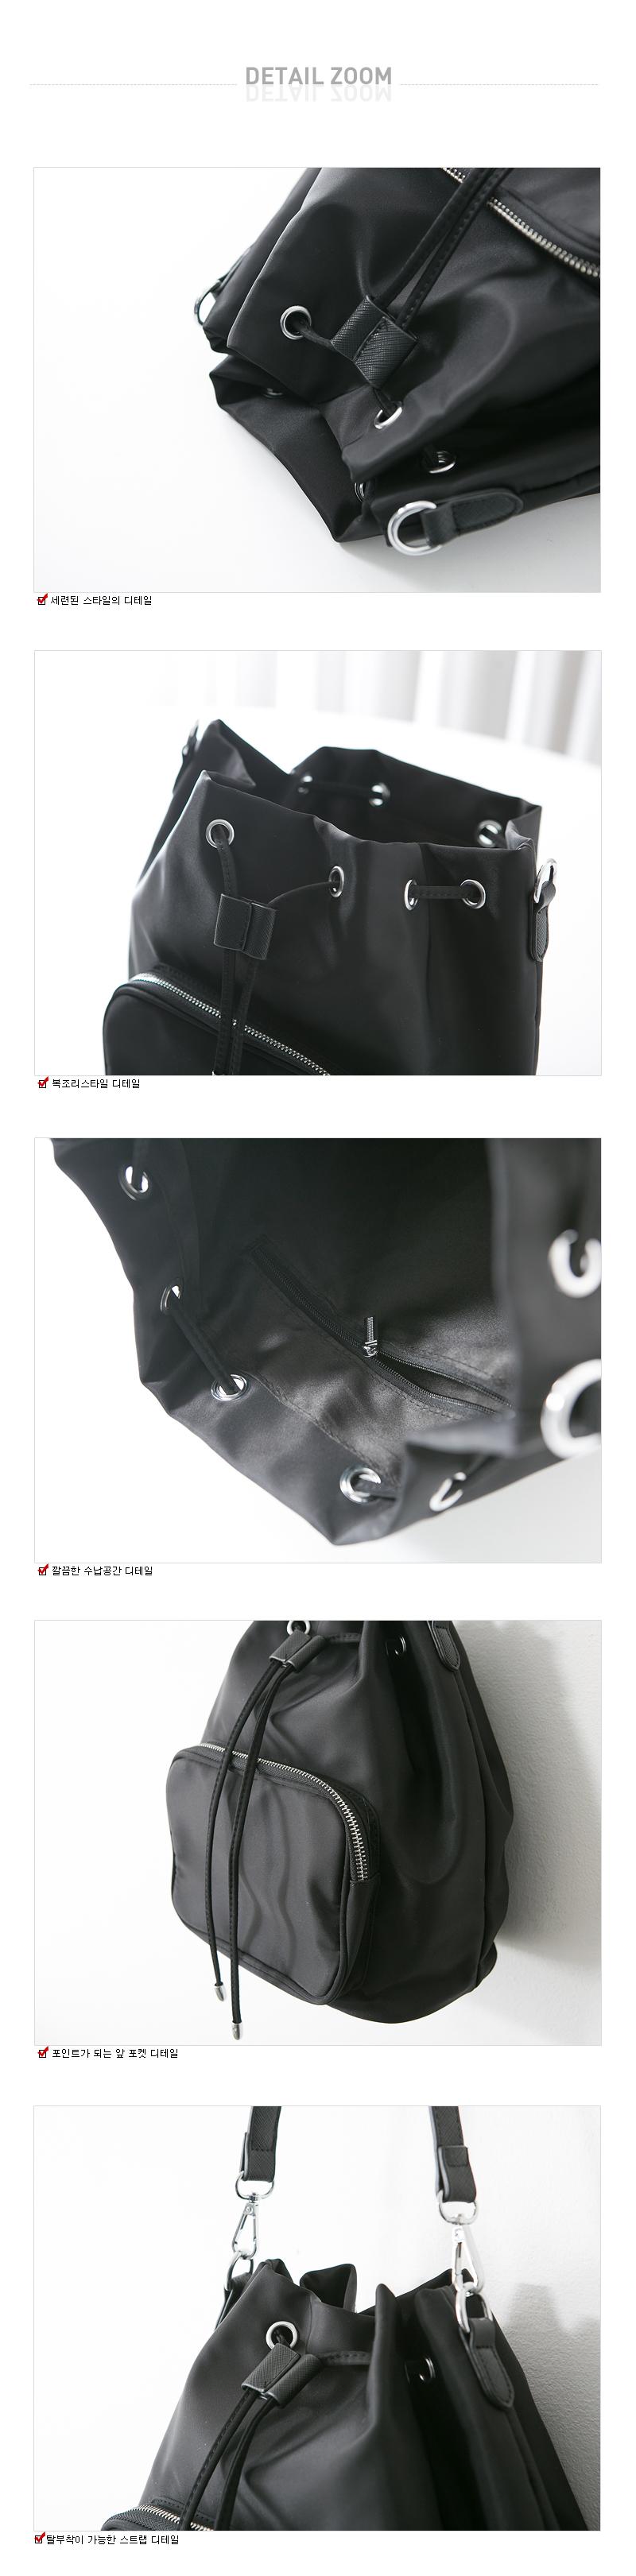 Bellin Compound Bag #84522